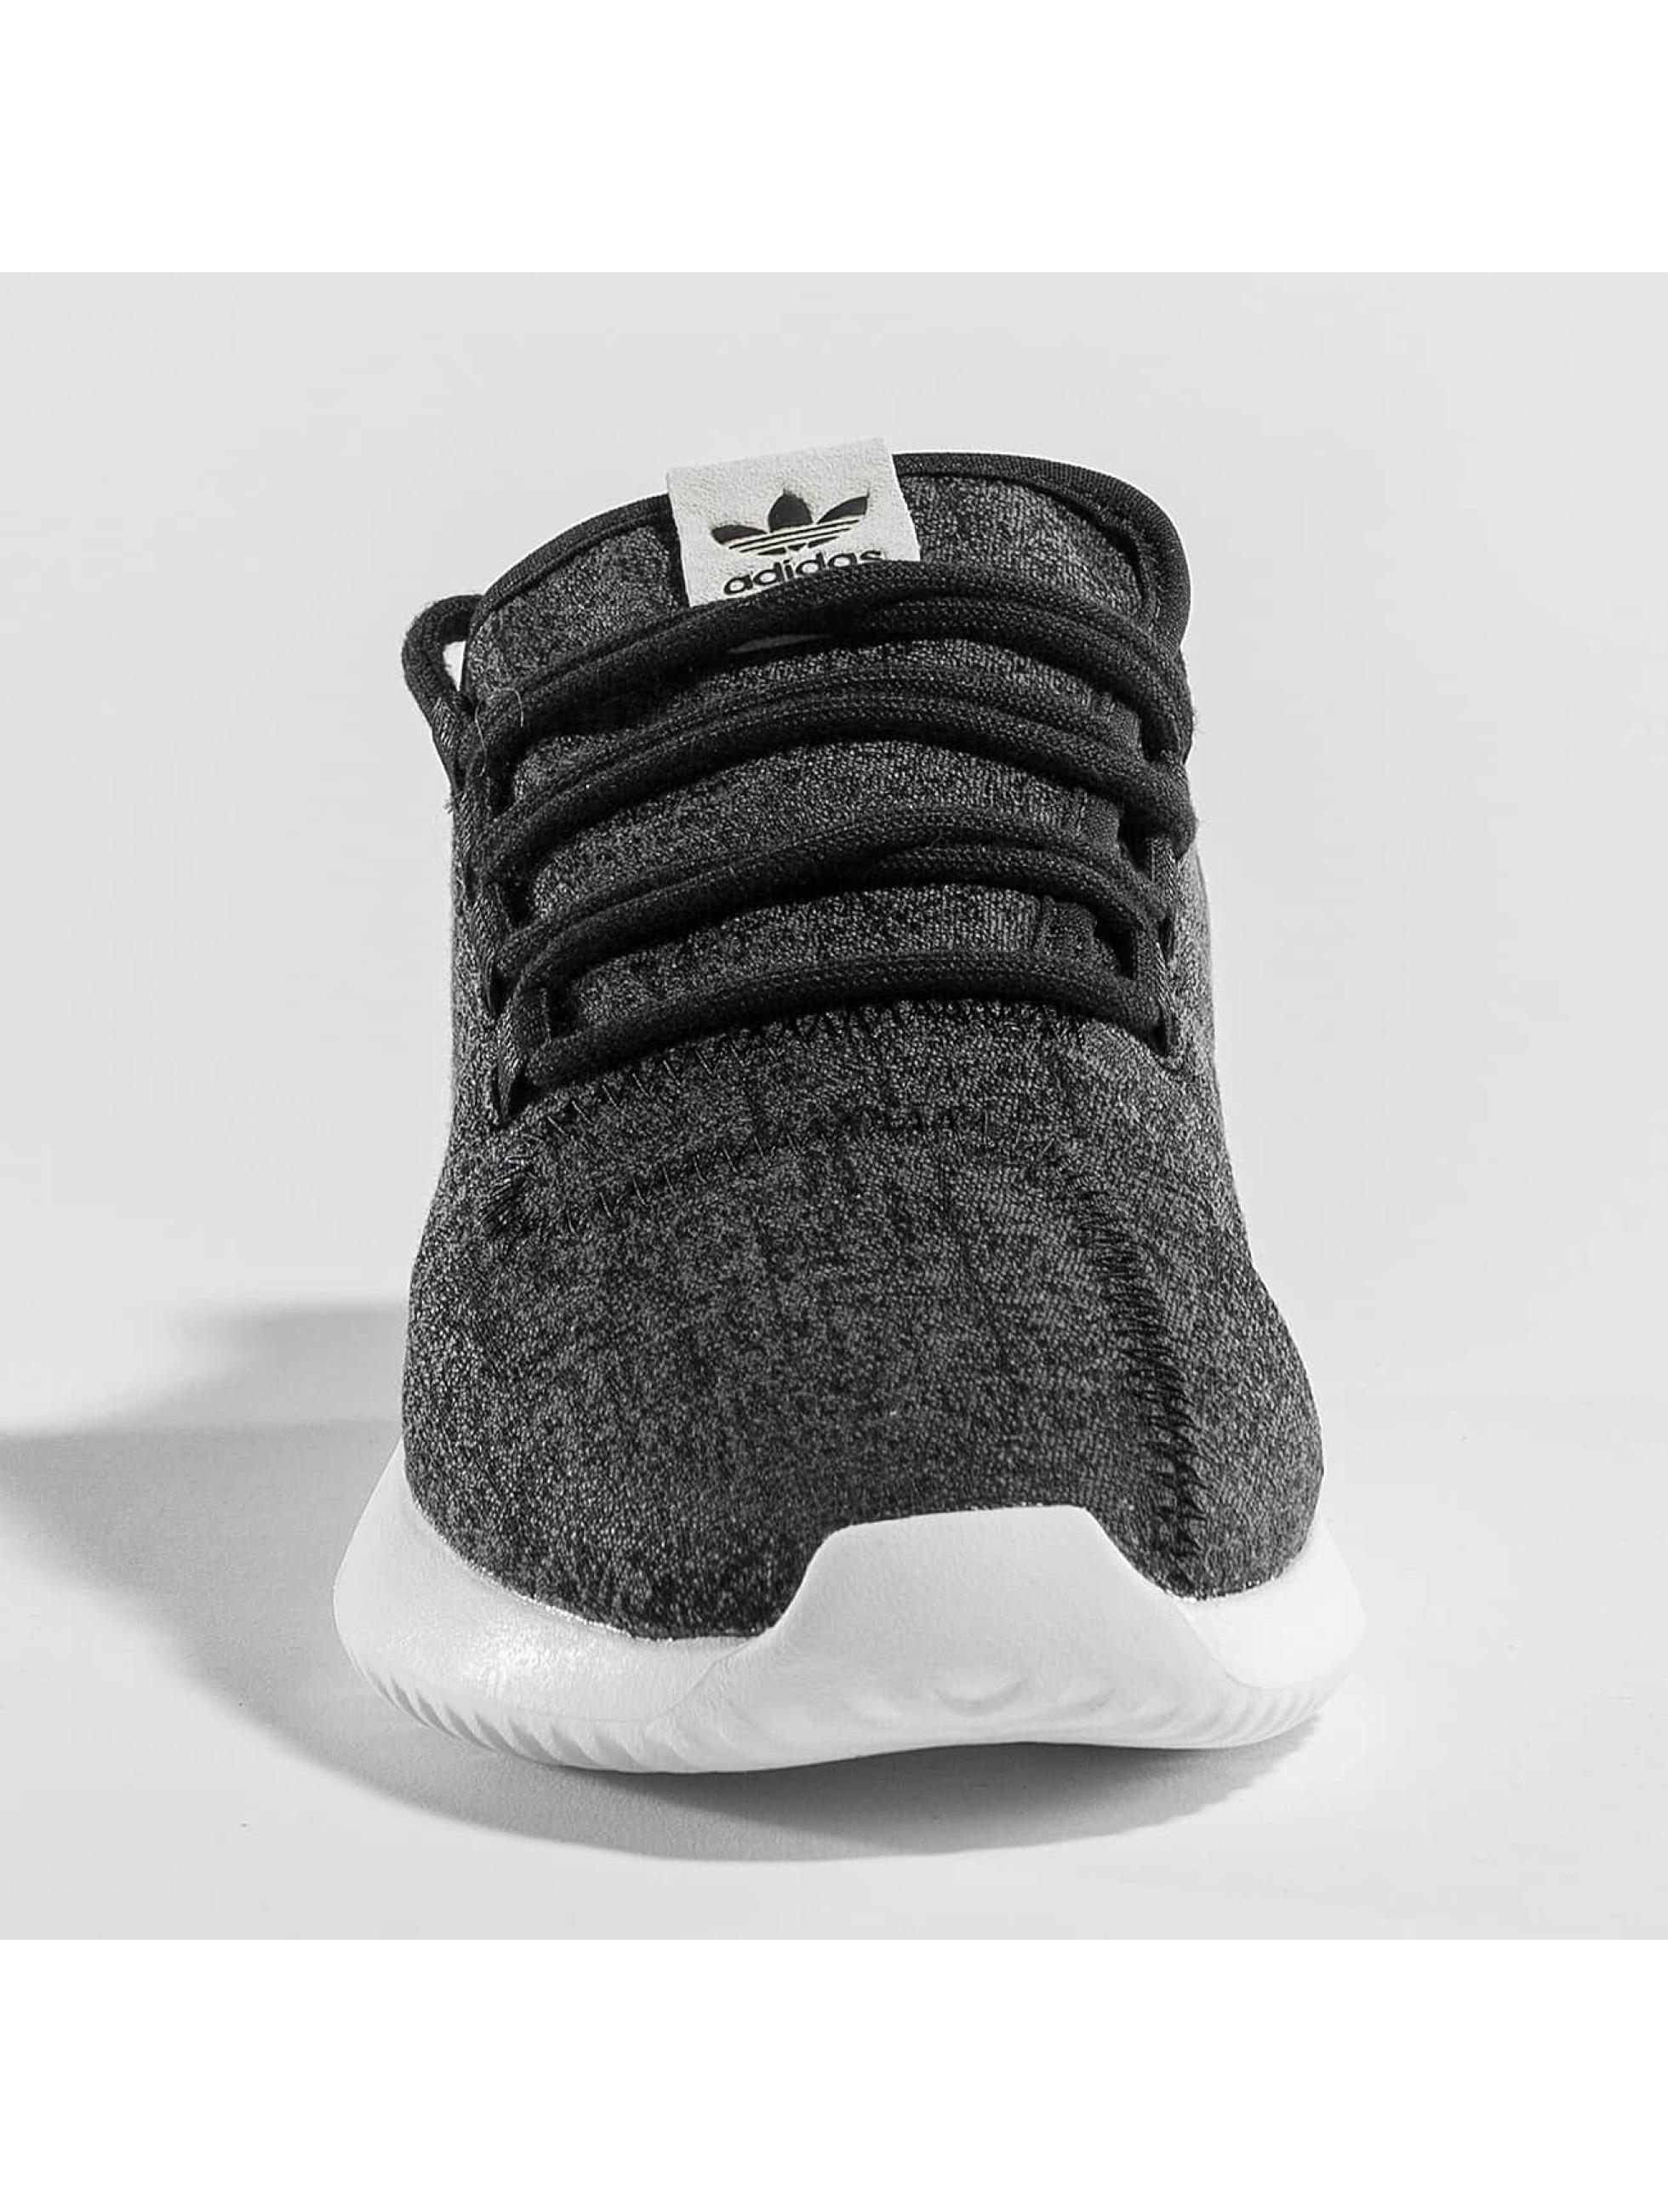 adidas originals Sneakers Tubular Shadow black